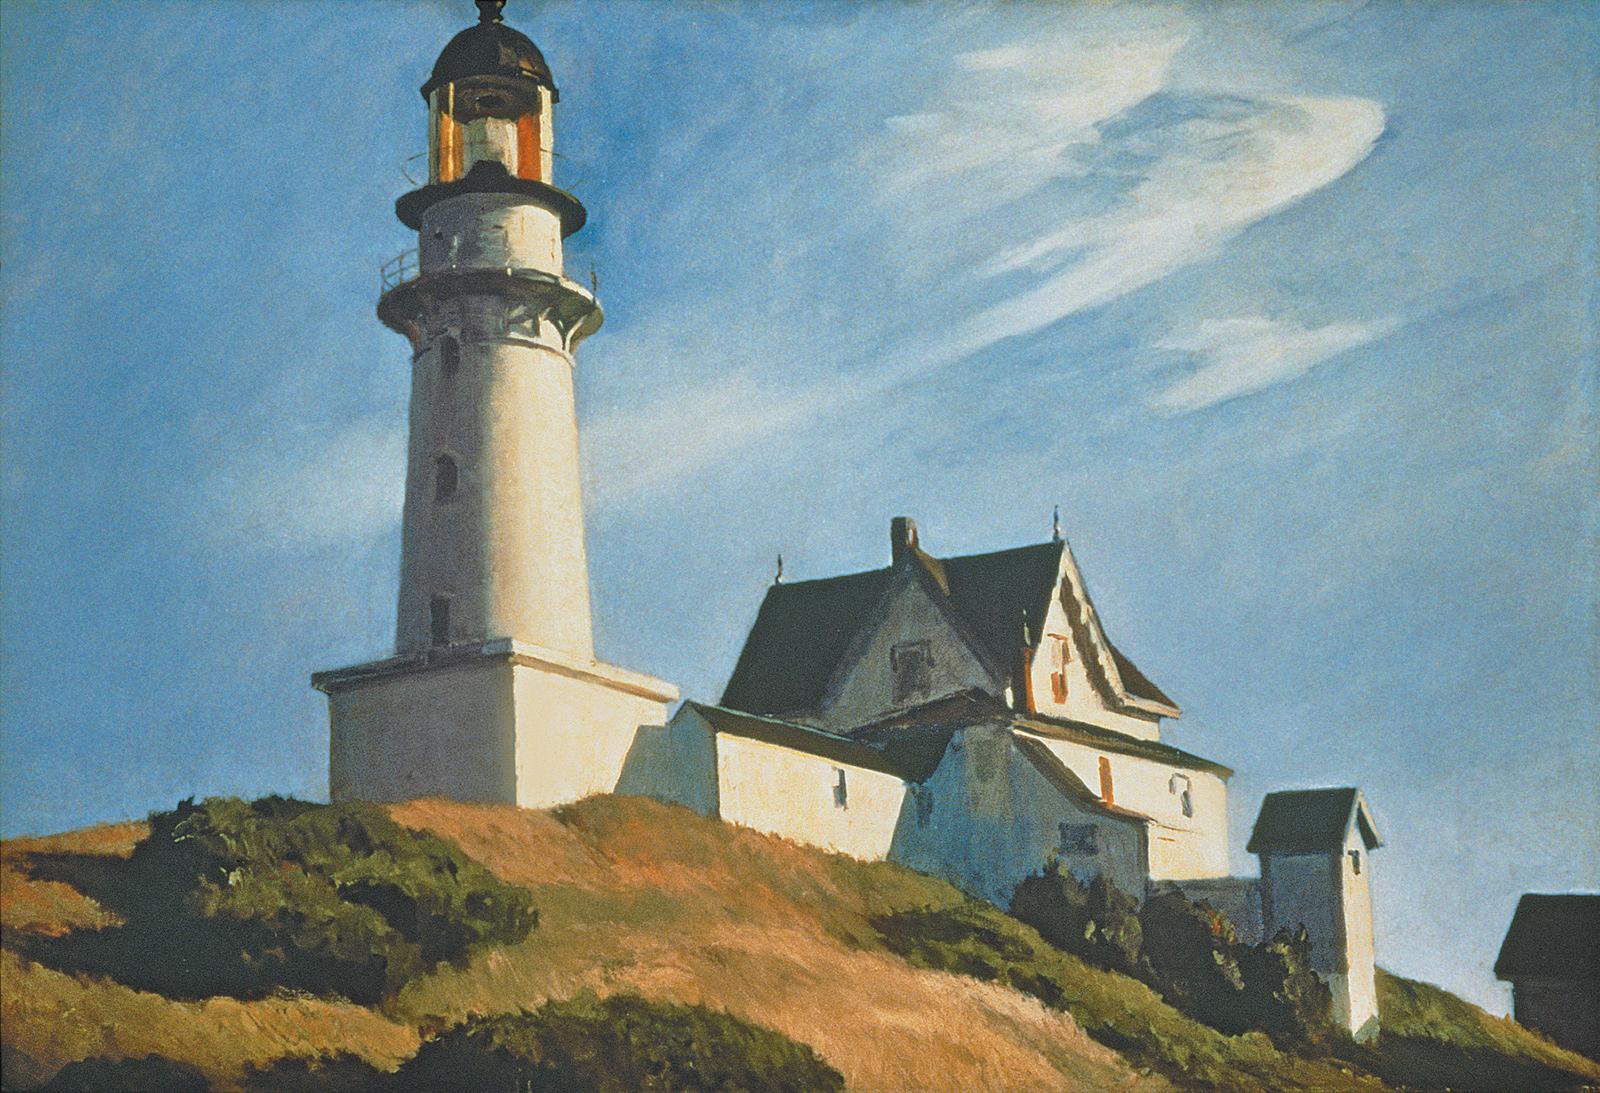 Edward Hopper: Lighthouse at Two Lights, 1929